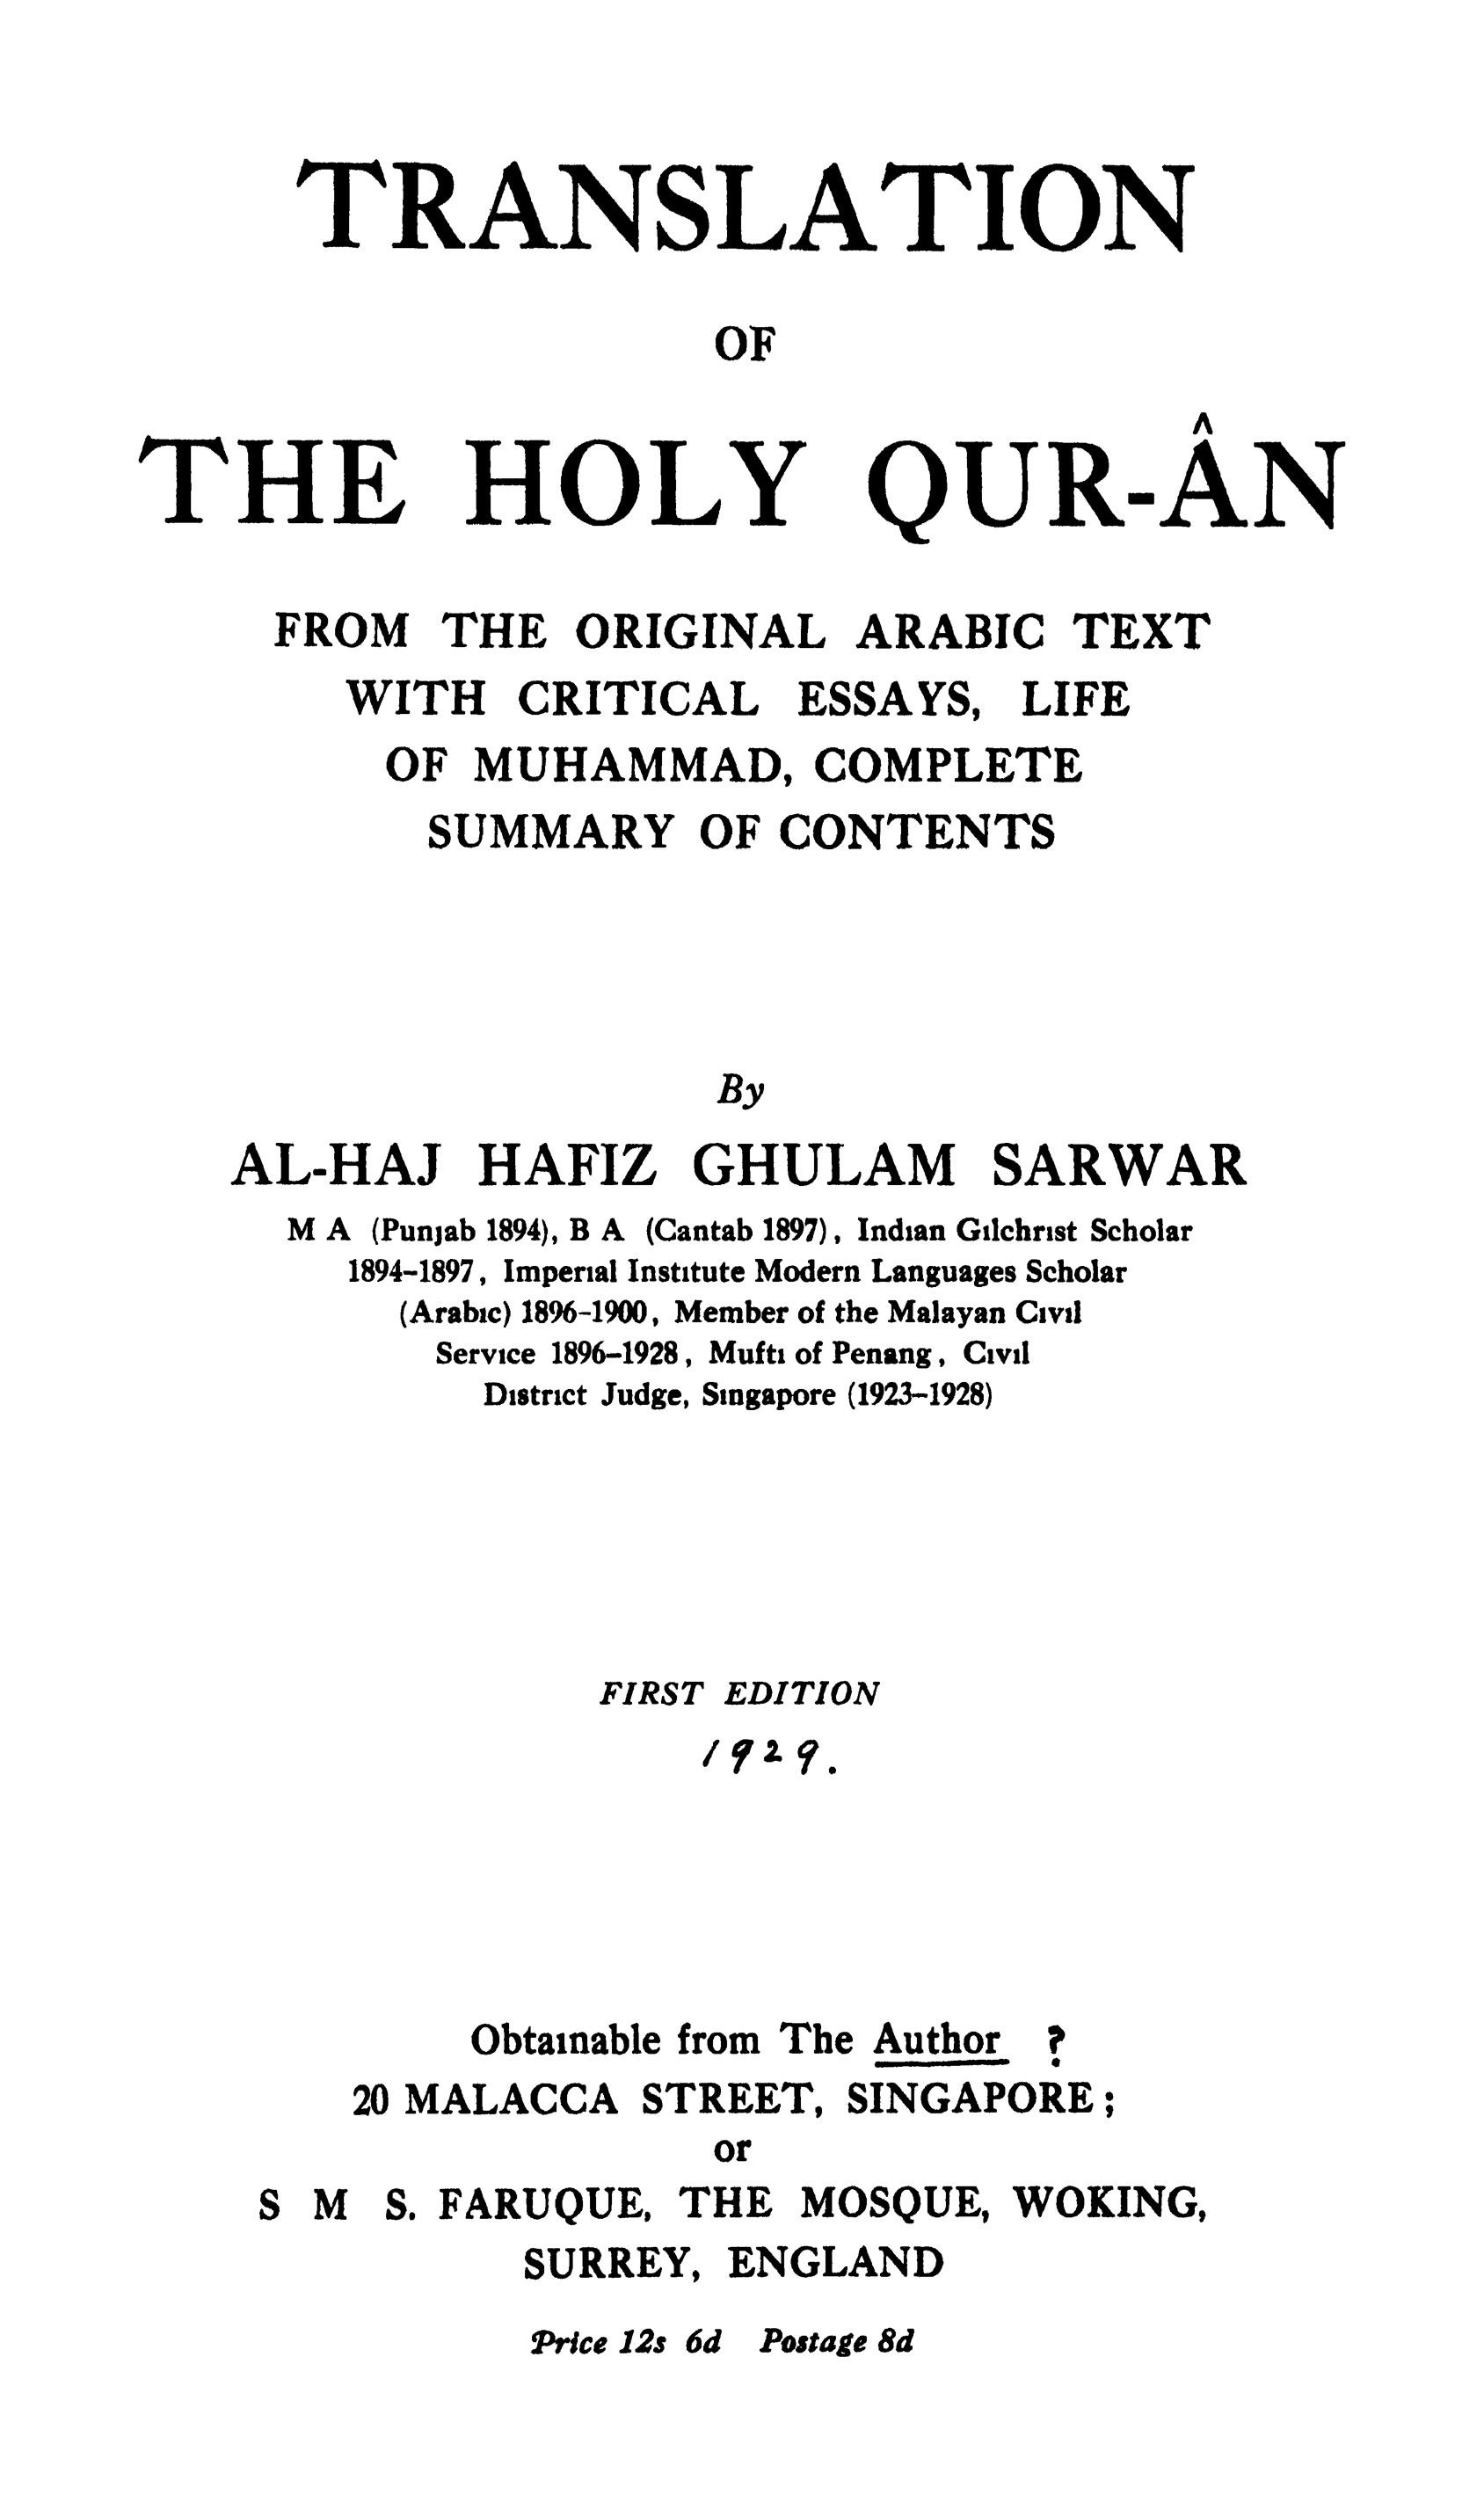 Ghulam Sarwar 1929 Quran Explorer, Page 2